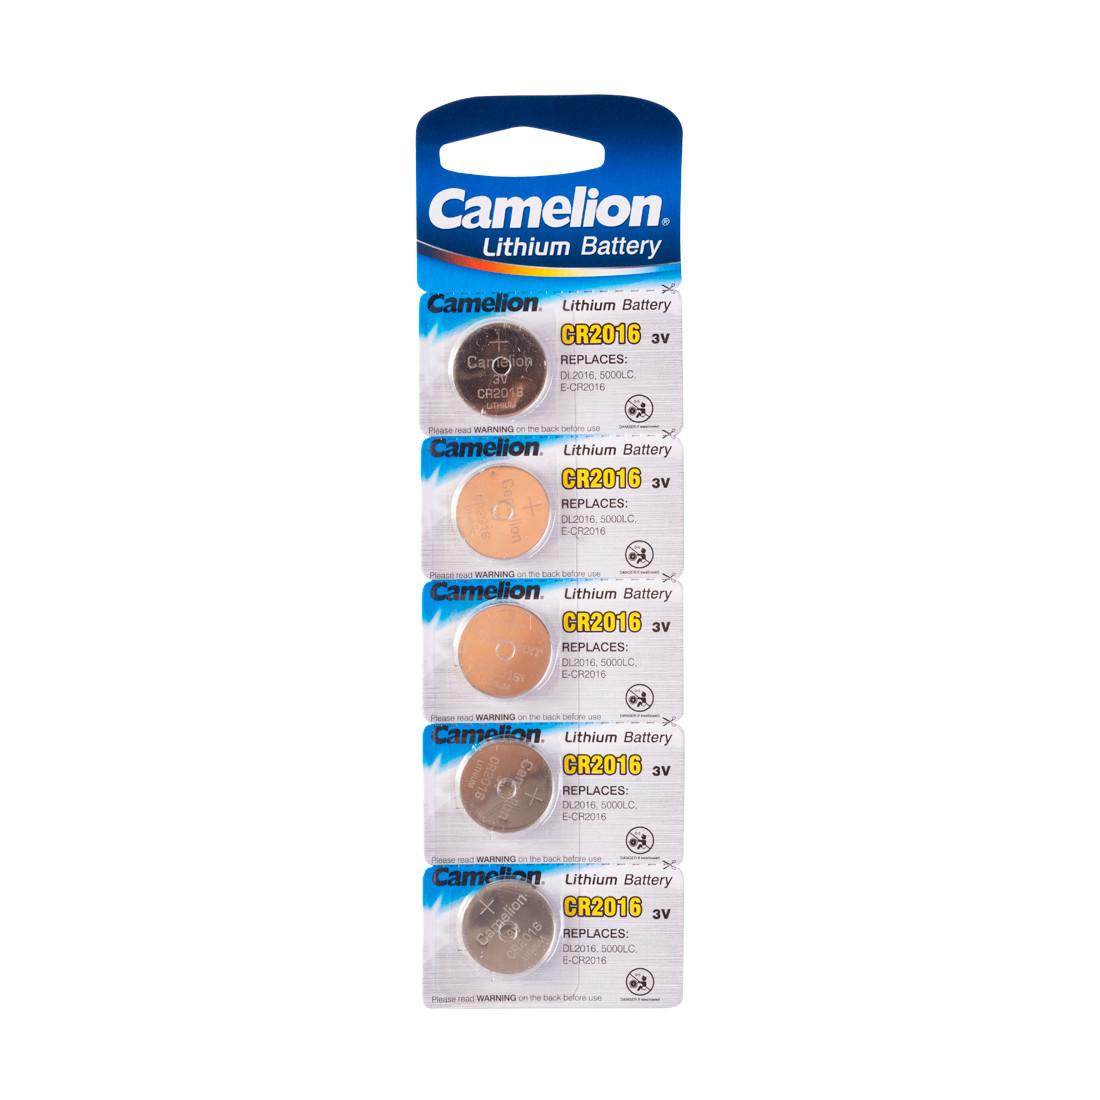 Батарейка Camelion CR2016-BP5 3 В, Упакова: Блистер 5 шт., Аналоги: CR2016\5000LC, Тип батареи: Литий-ионный